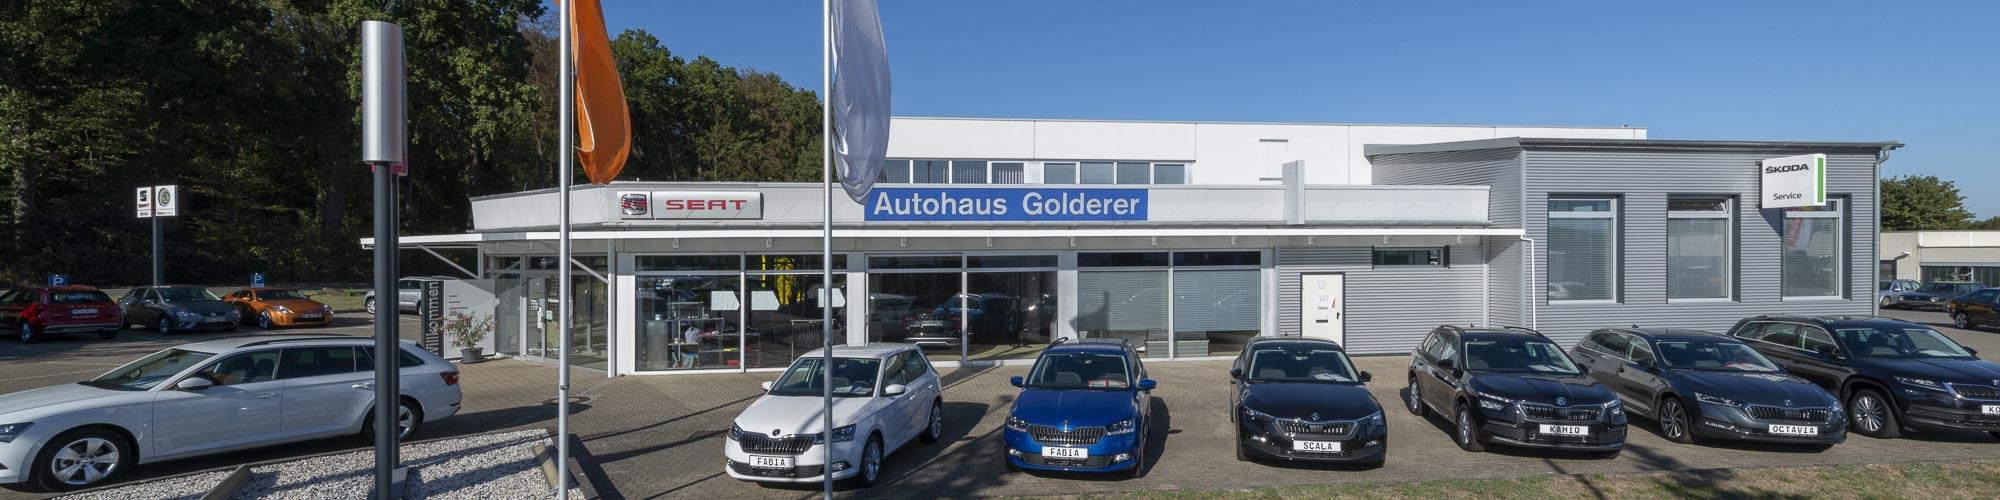 Autohaus am Limes Golderer